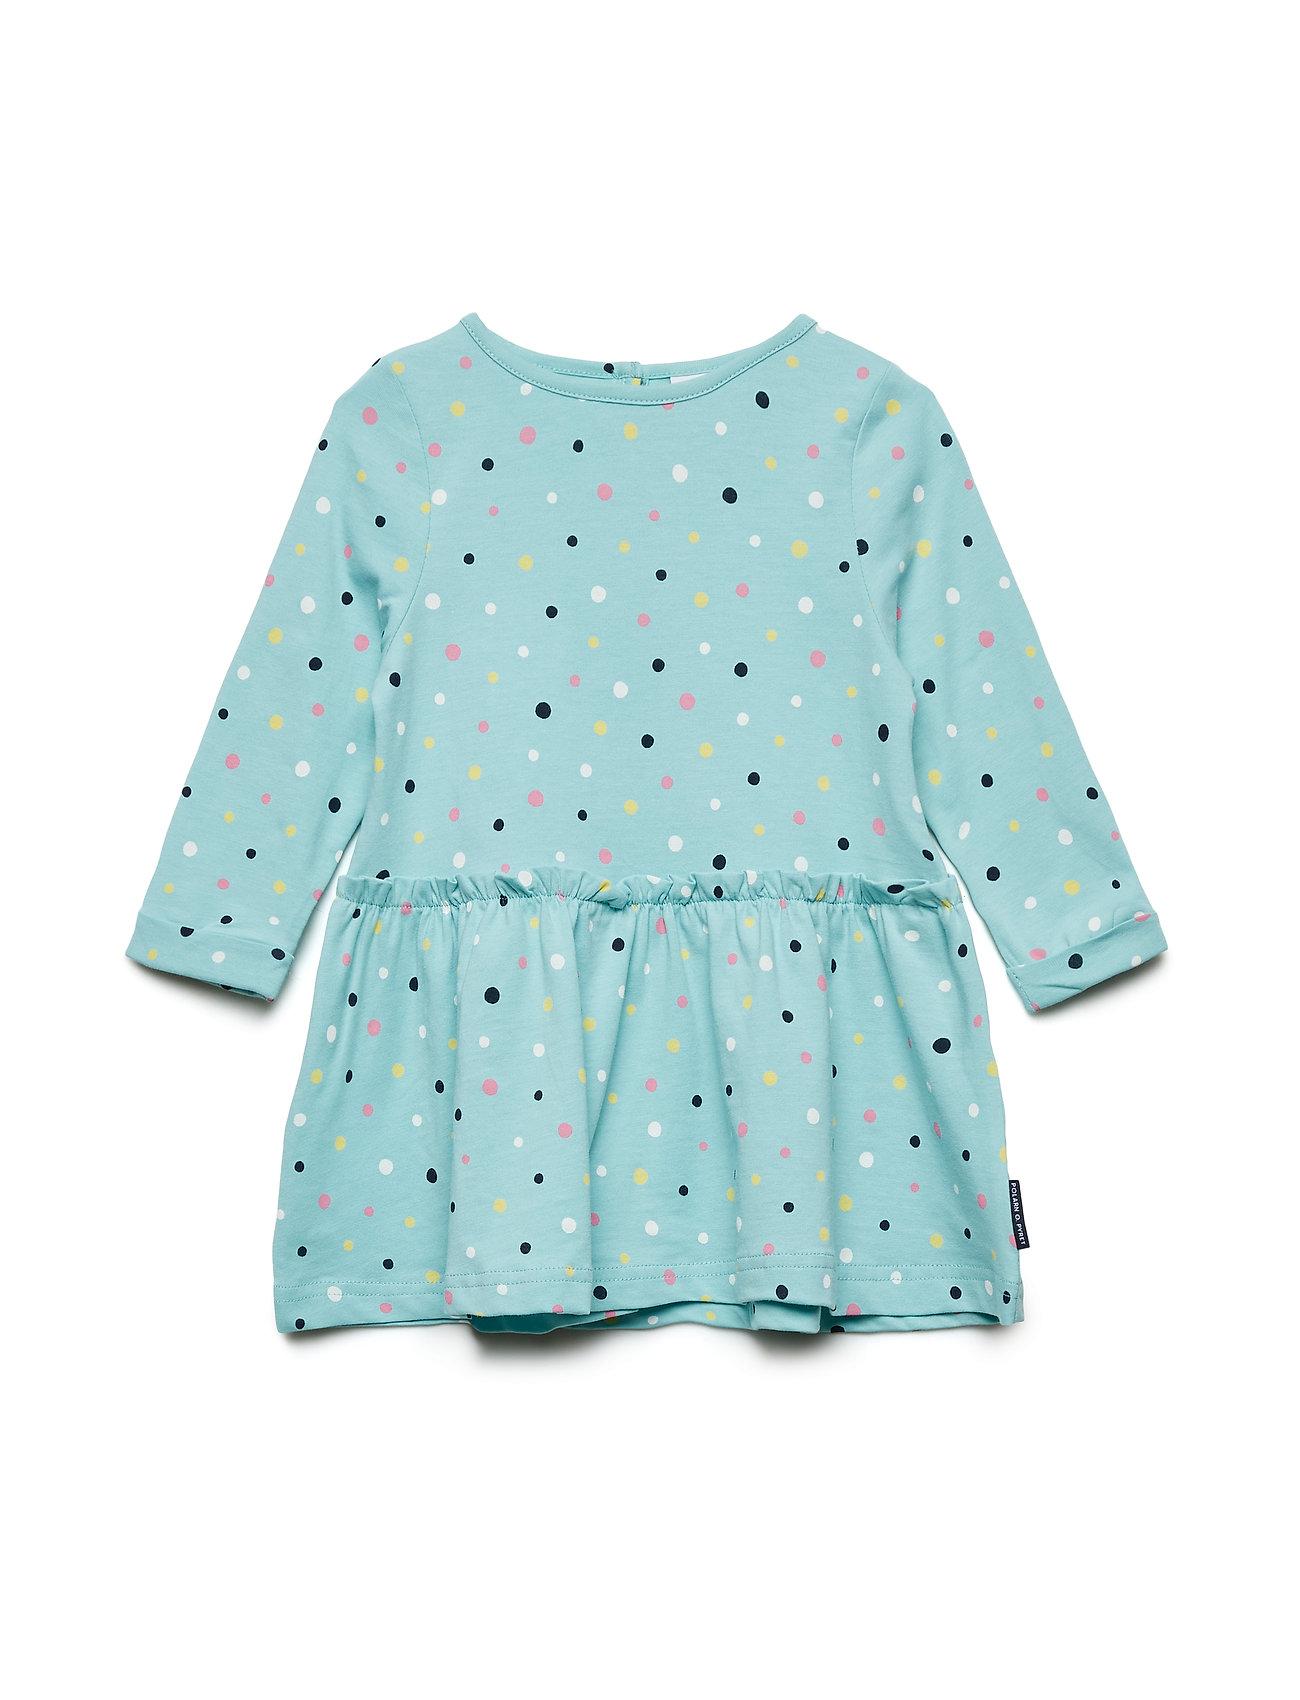 Polarn O. Pyret Dress Long Sleeve with print Preschool